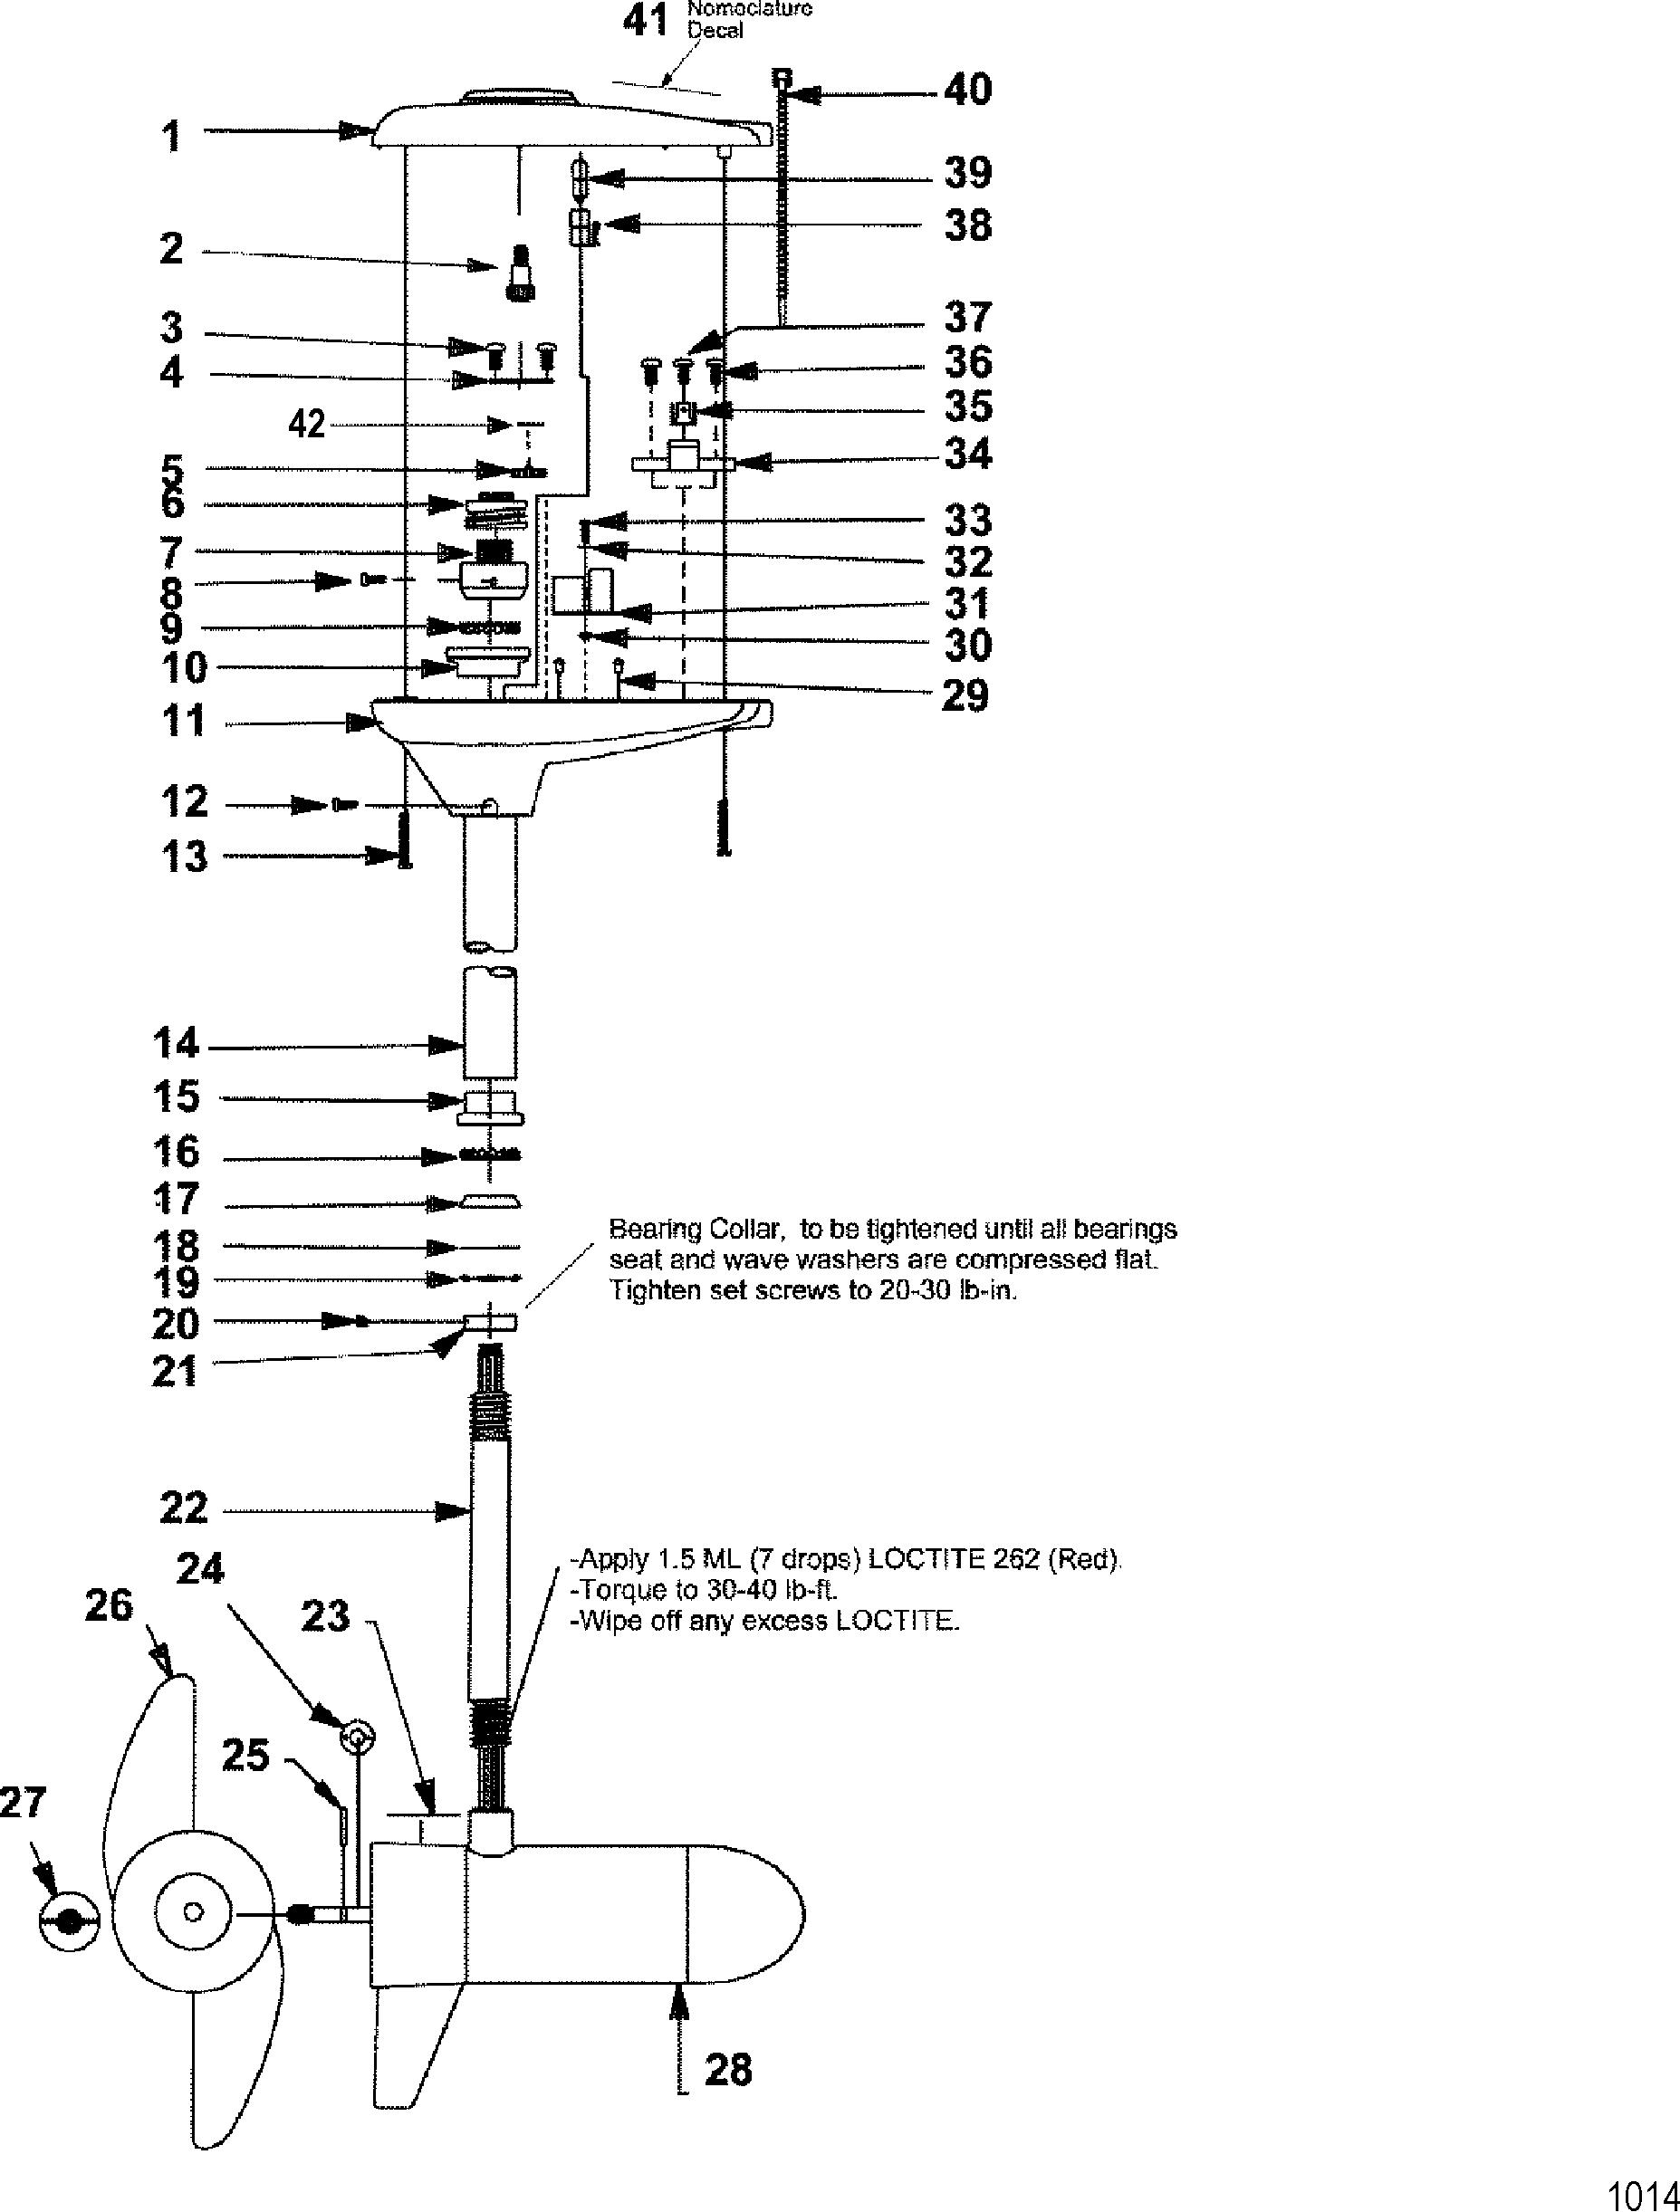 Trolling Motor 9b000001 Thru 9b086579 Wire Diagrammodel Te784v 36